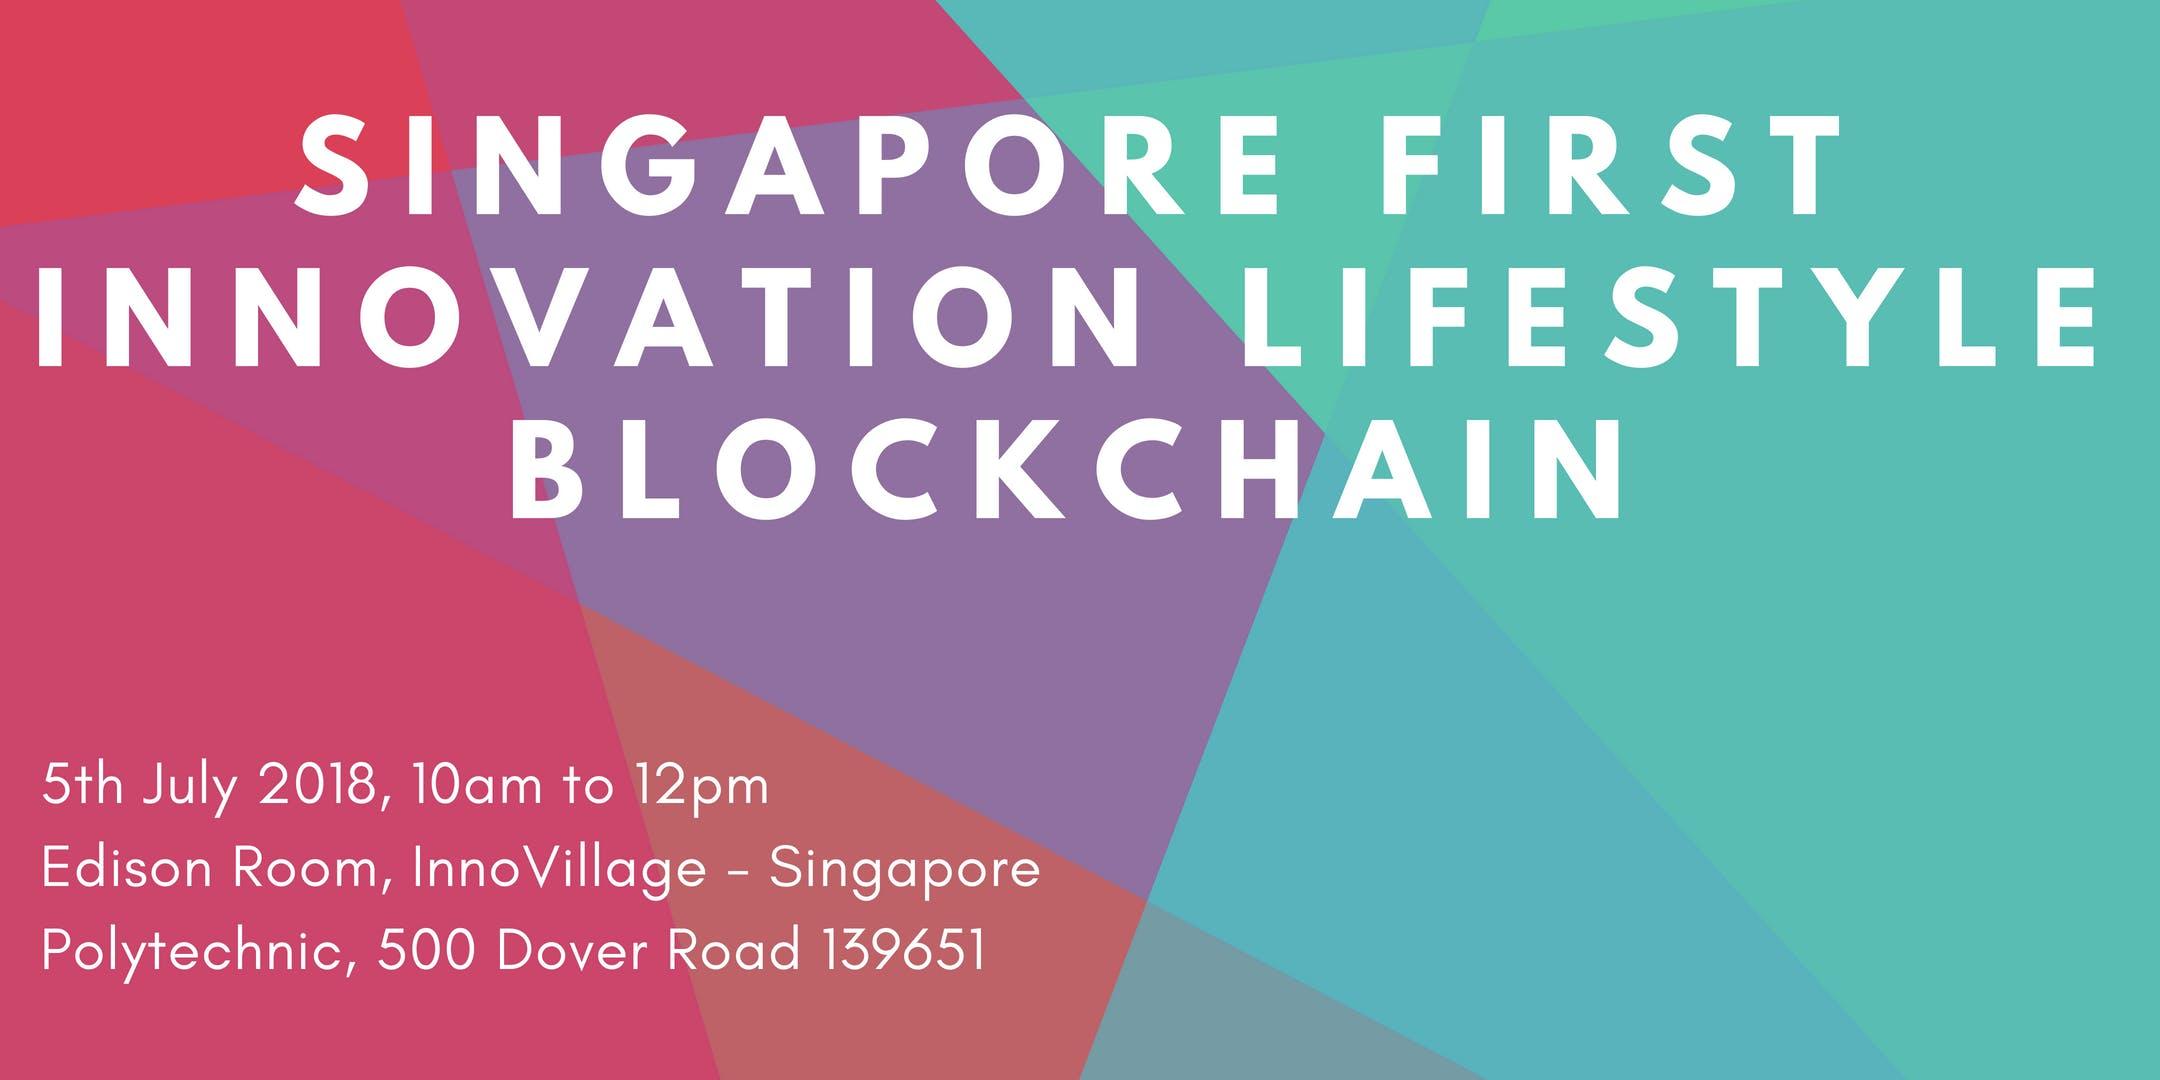 Singapore First Innovation Lifestyle Blockchain